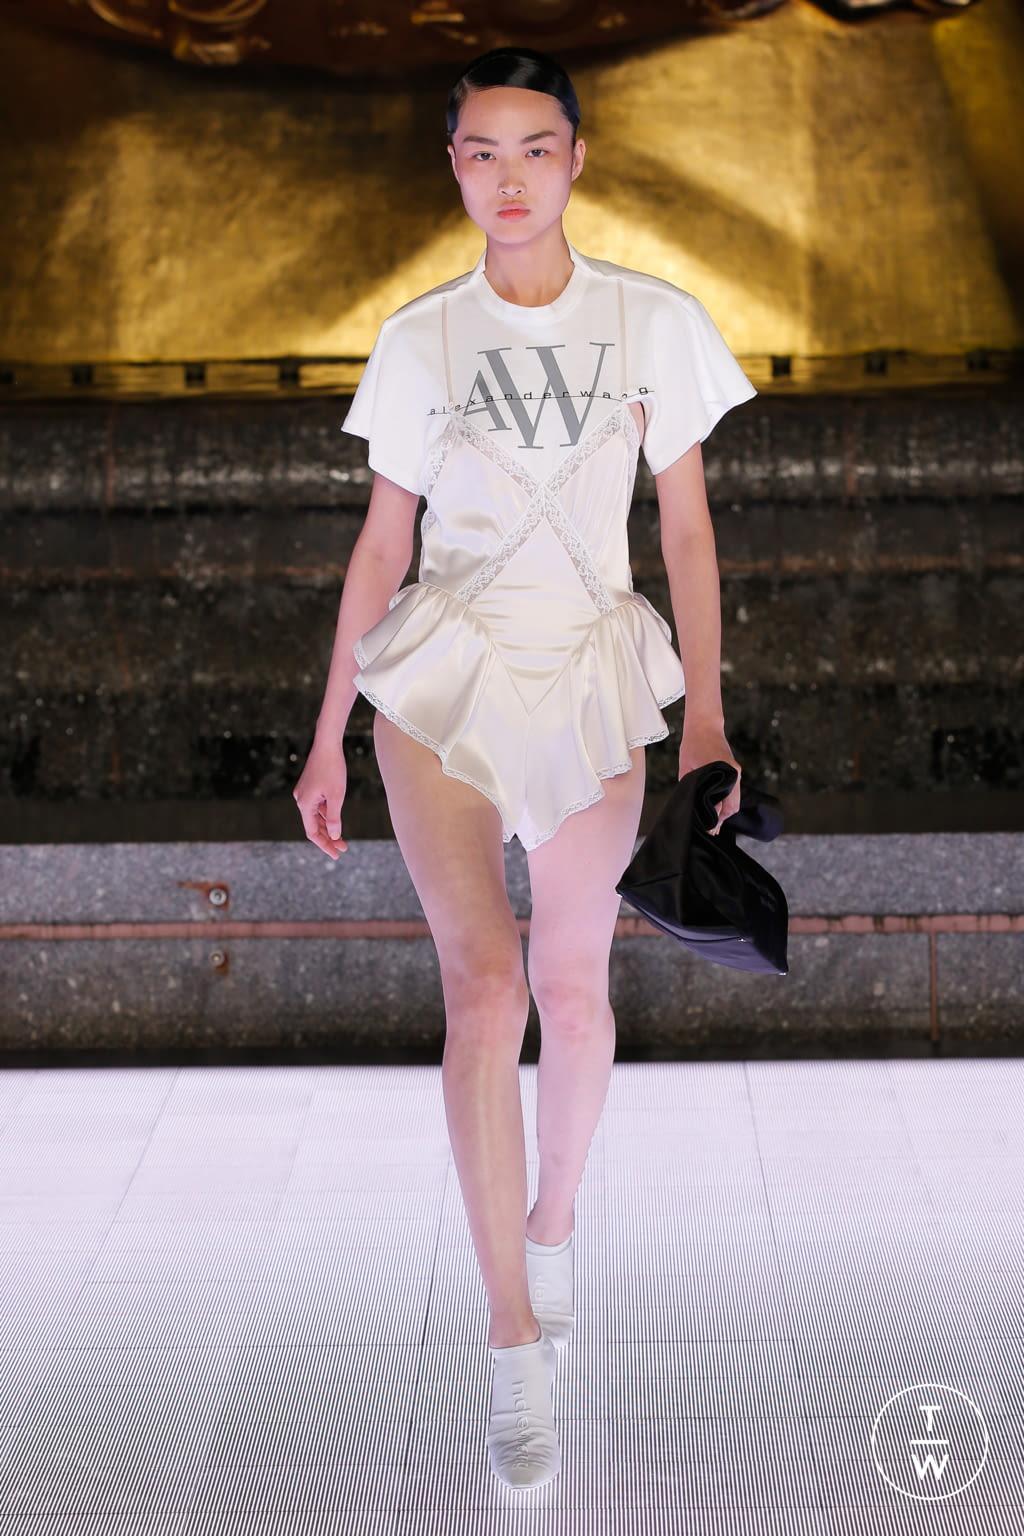 Scarpe Sposa Alexander Wang.Alexander Wang Ss20 Womenswear 29 The Fashion Search Engine